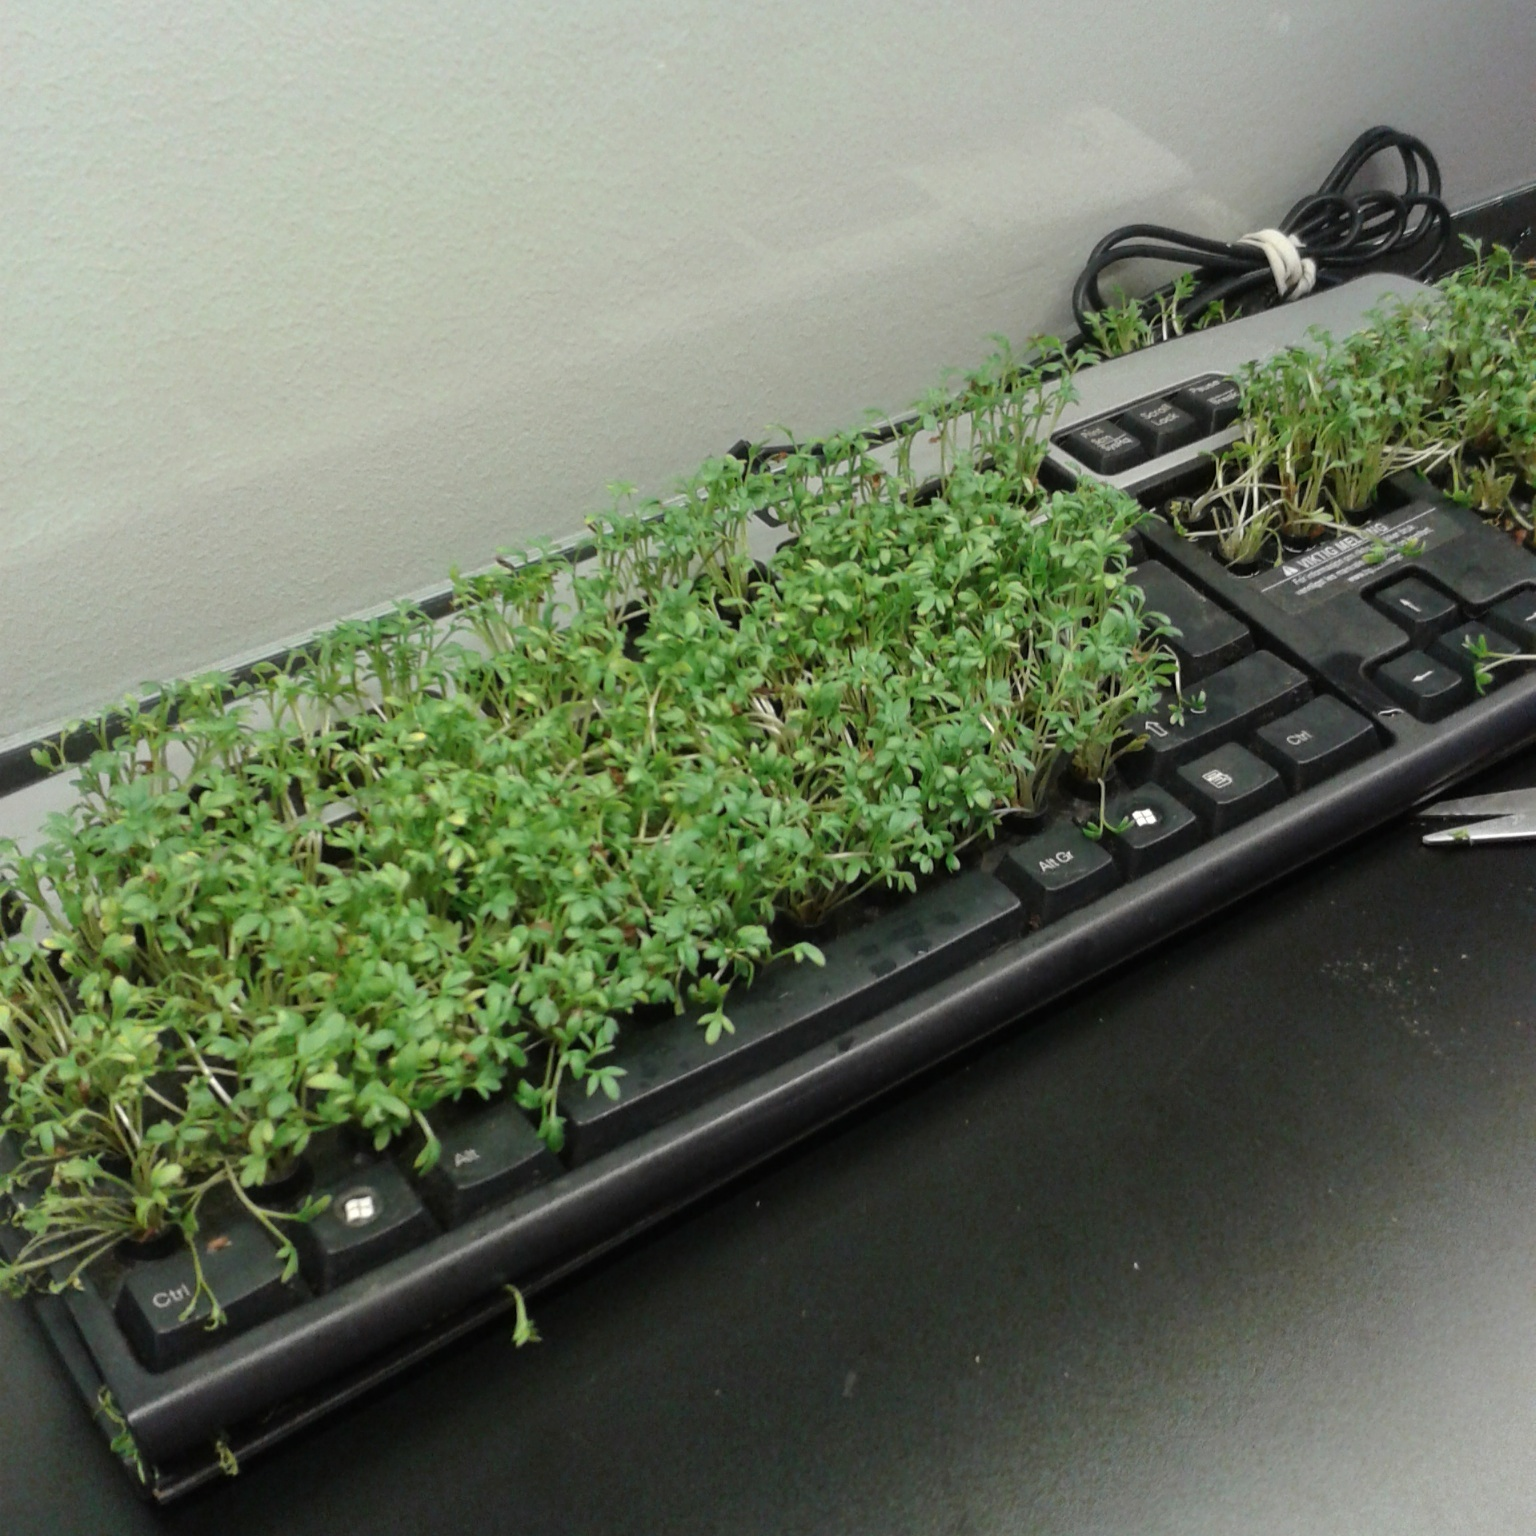 sprouting keyboard 2.0